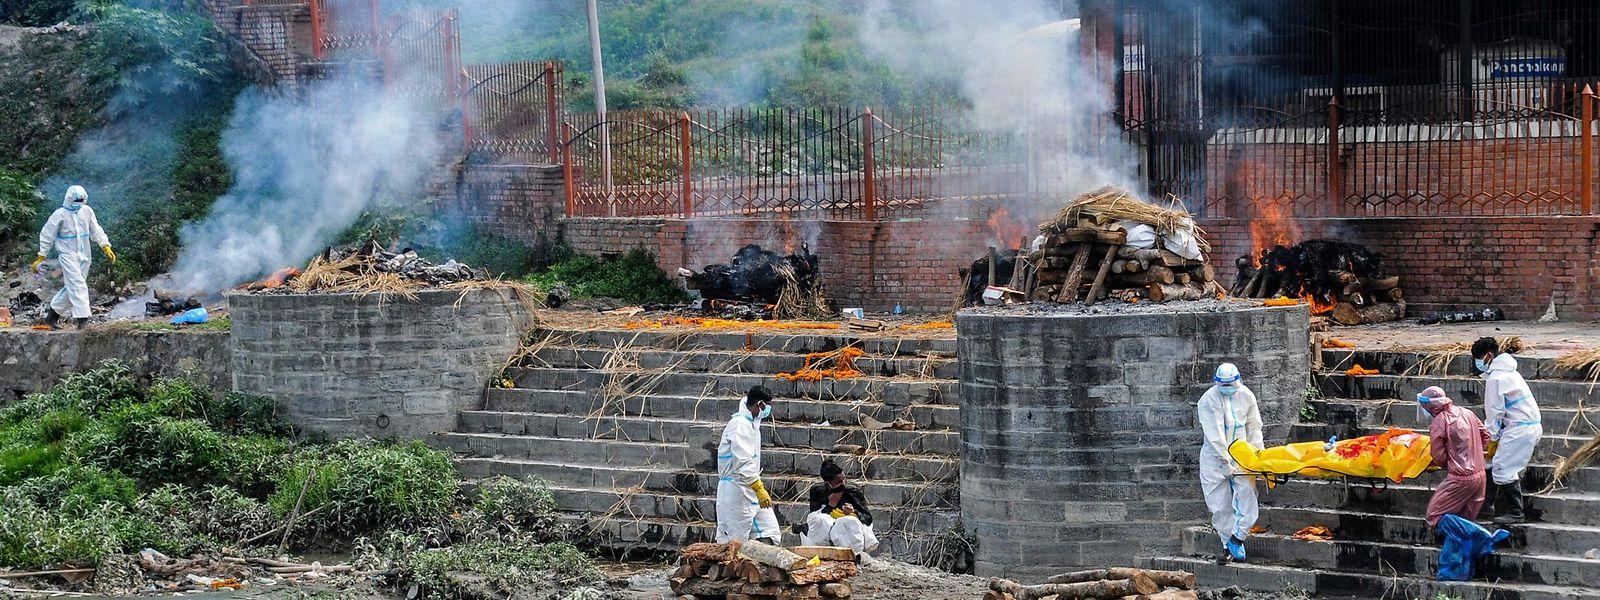 Am Ufer des Flusses Bagmati in Kathmandu werden zunehmend auch Corona-Opfer kremiert.